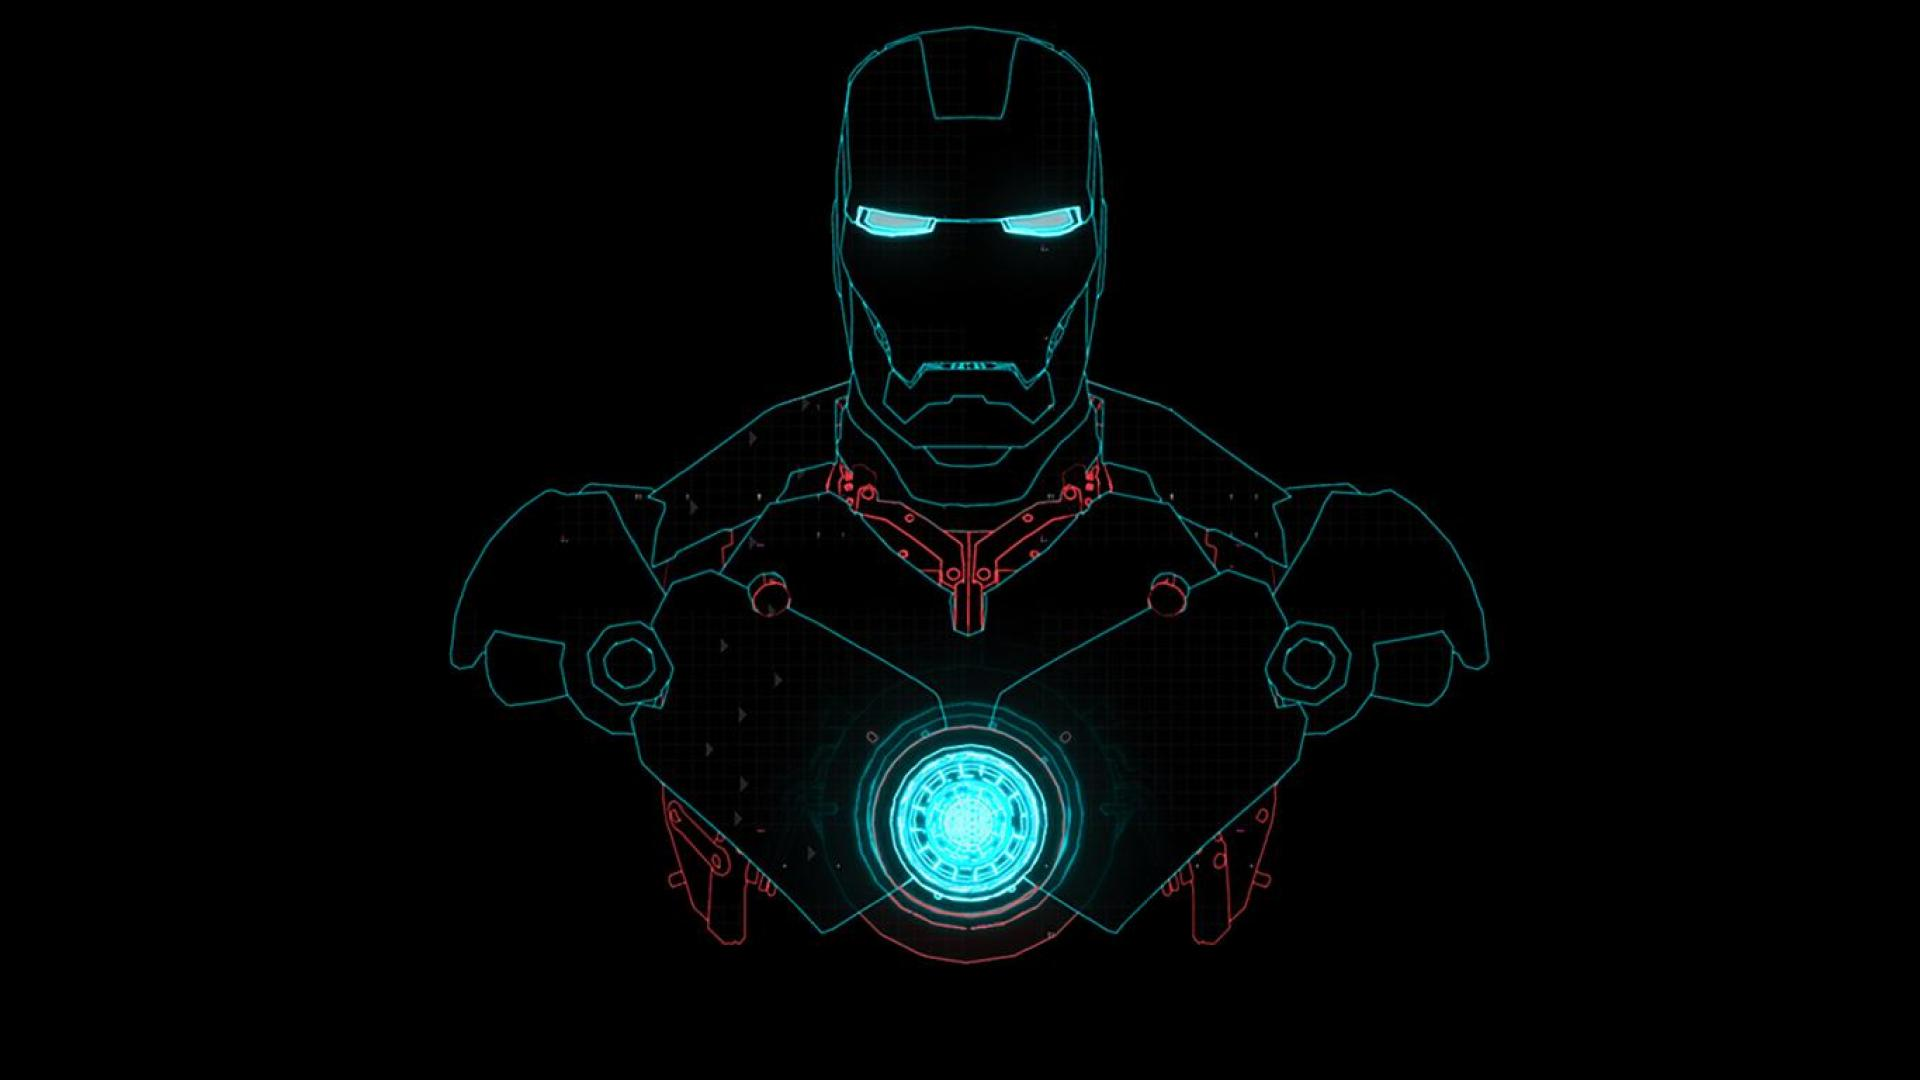 fonds d'écran iron man, tony stark, robot, lumières électriques